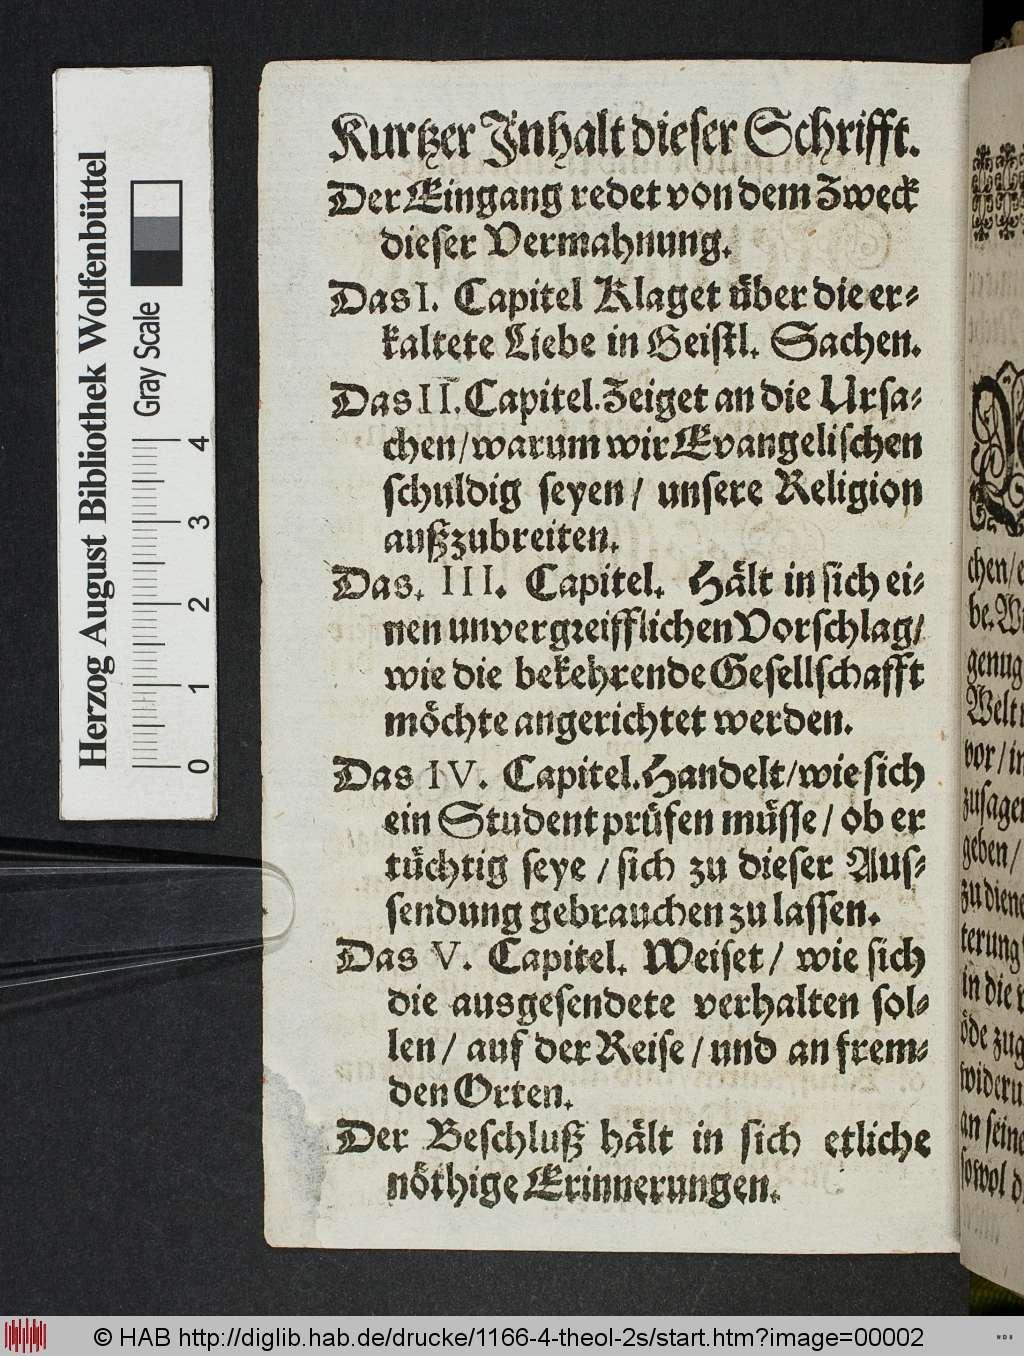 http://diglib.hab.de/drucke/1166-4-theol-2s/00002.jpg